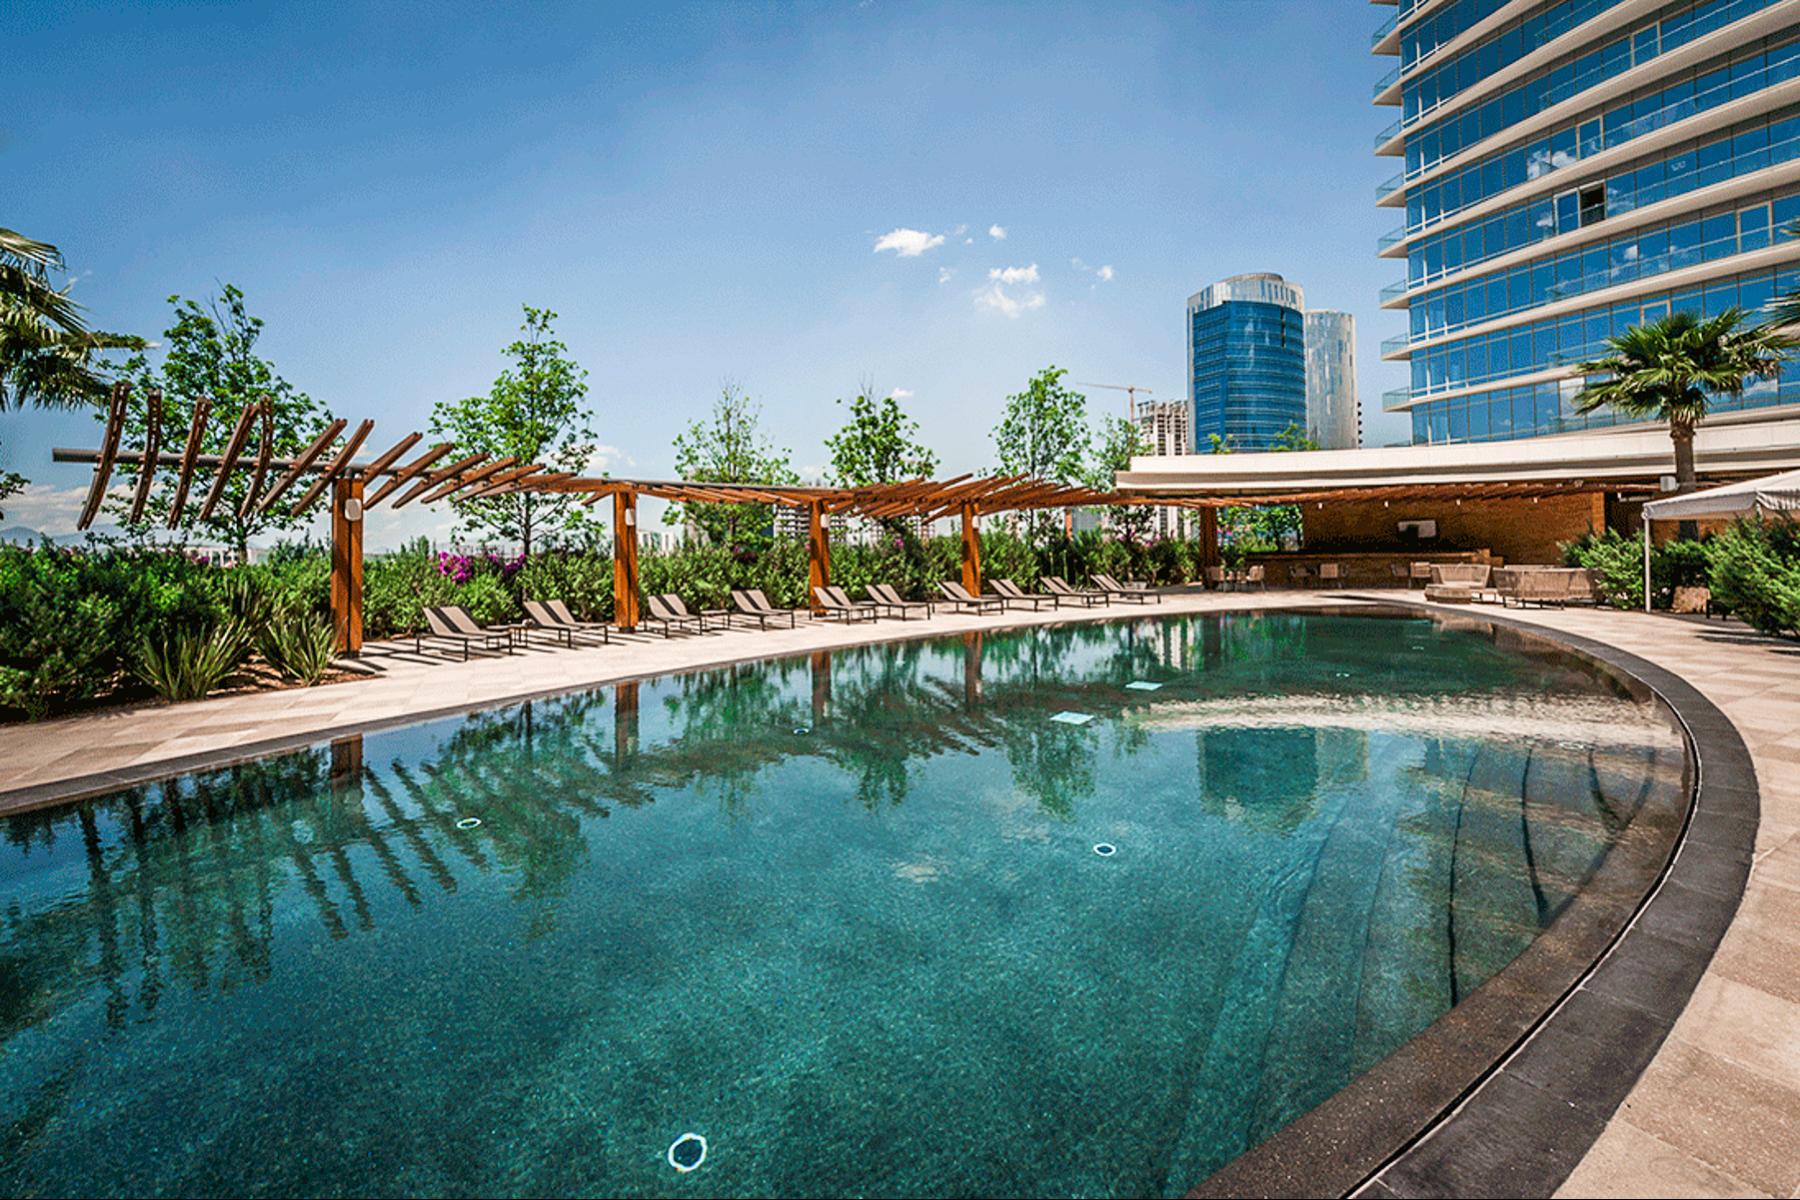 Additional photo for property listing at Magnifico Departamento S-2901 Monterrey, Nuevo Leon Mexico